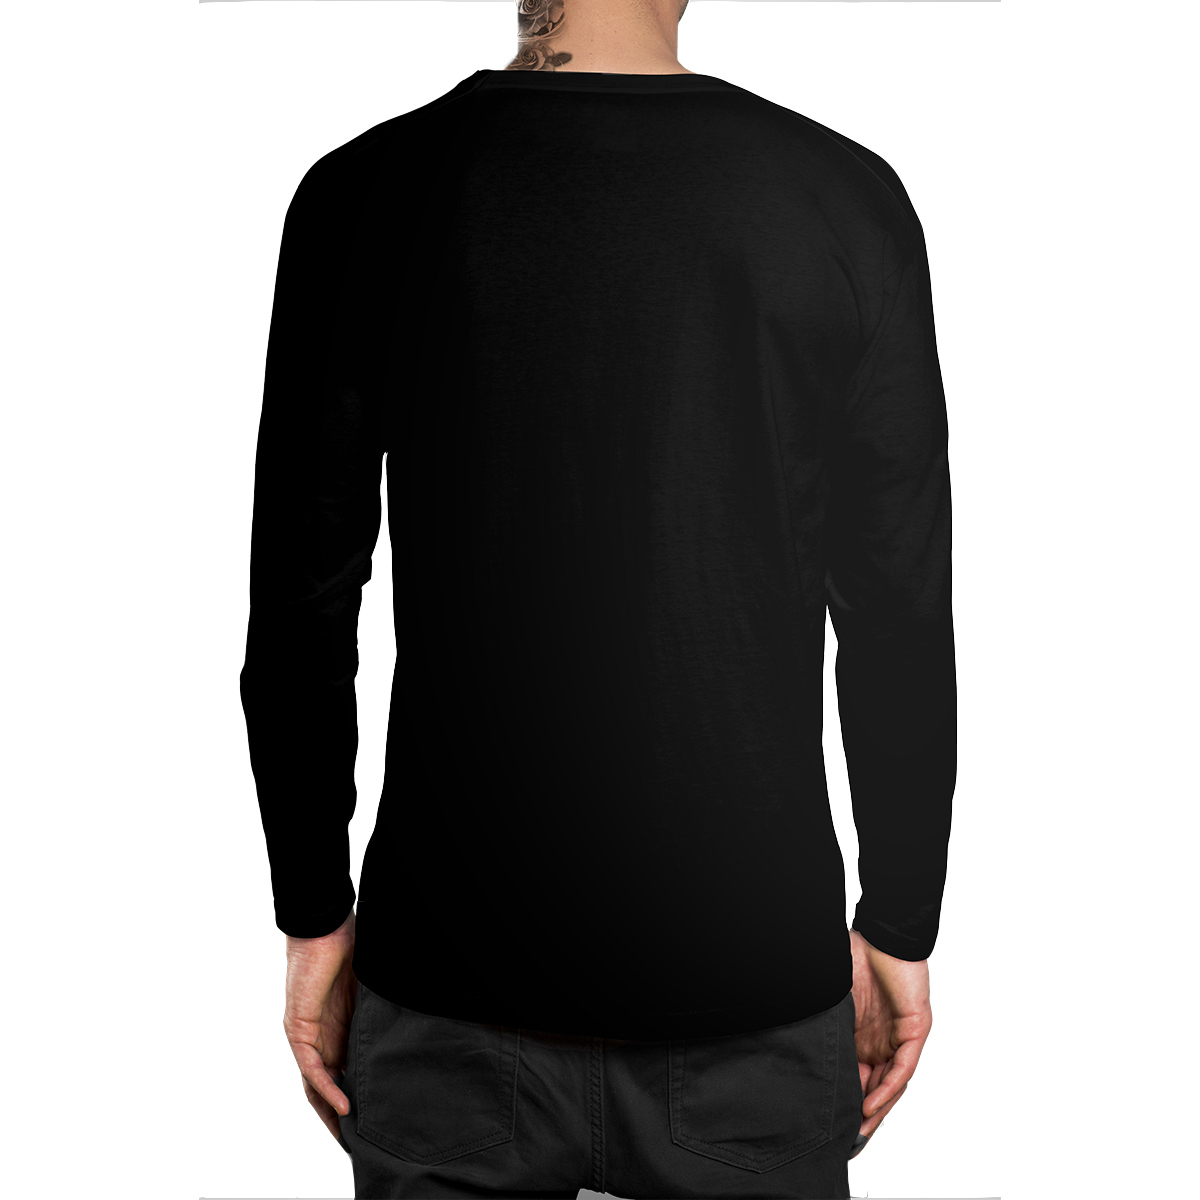 Stompy Camiseta Manga Longa Modelo 33